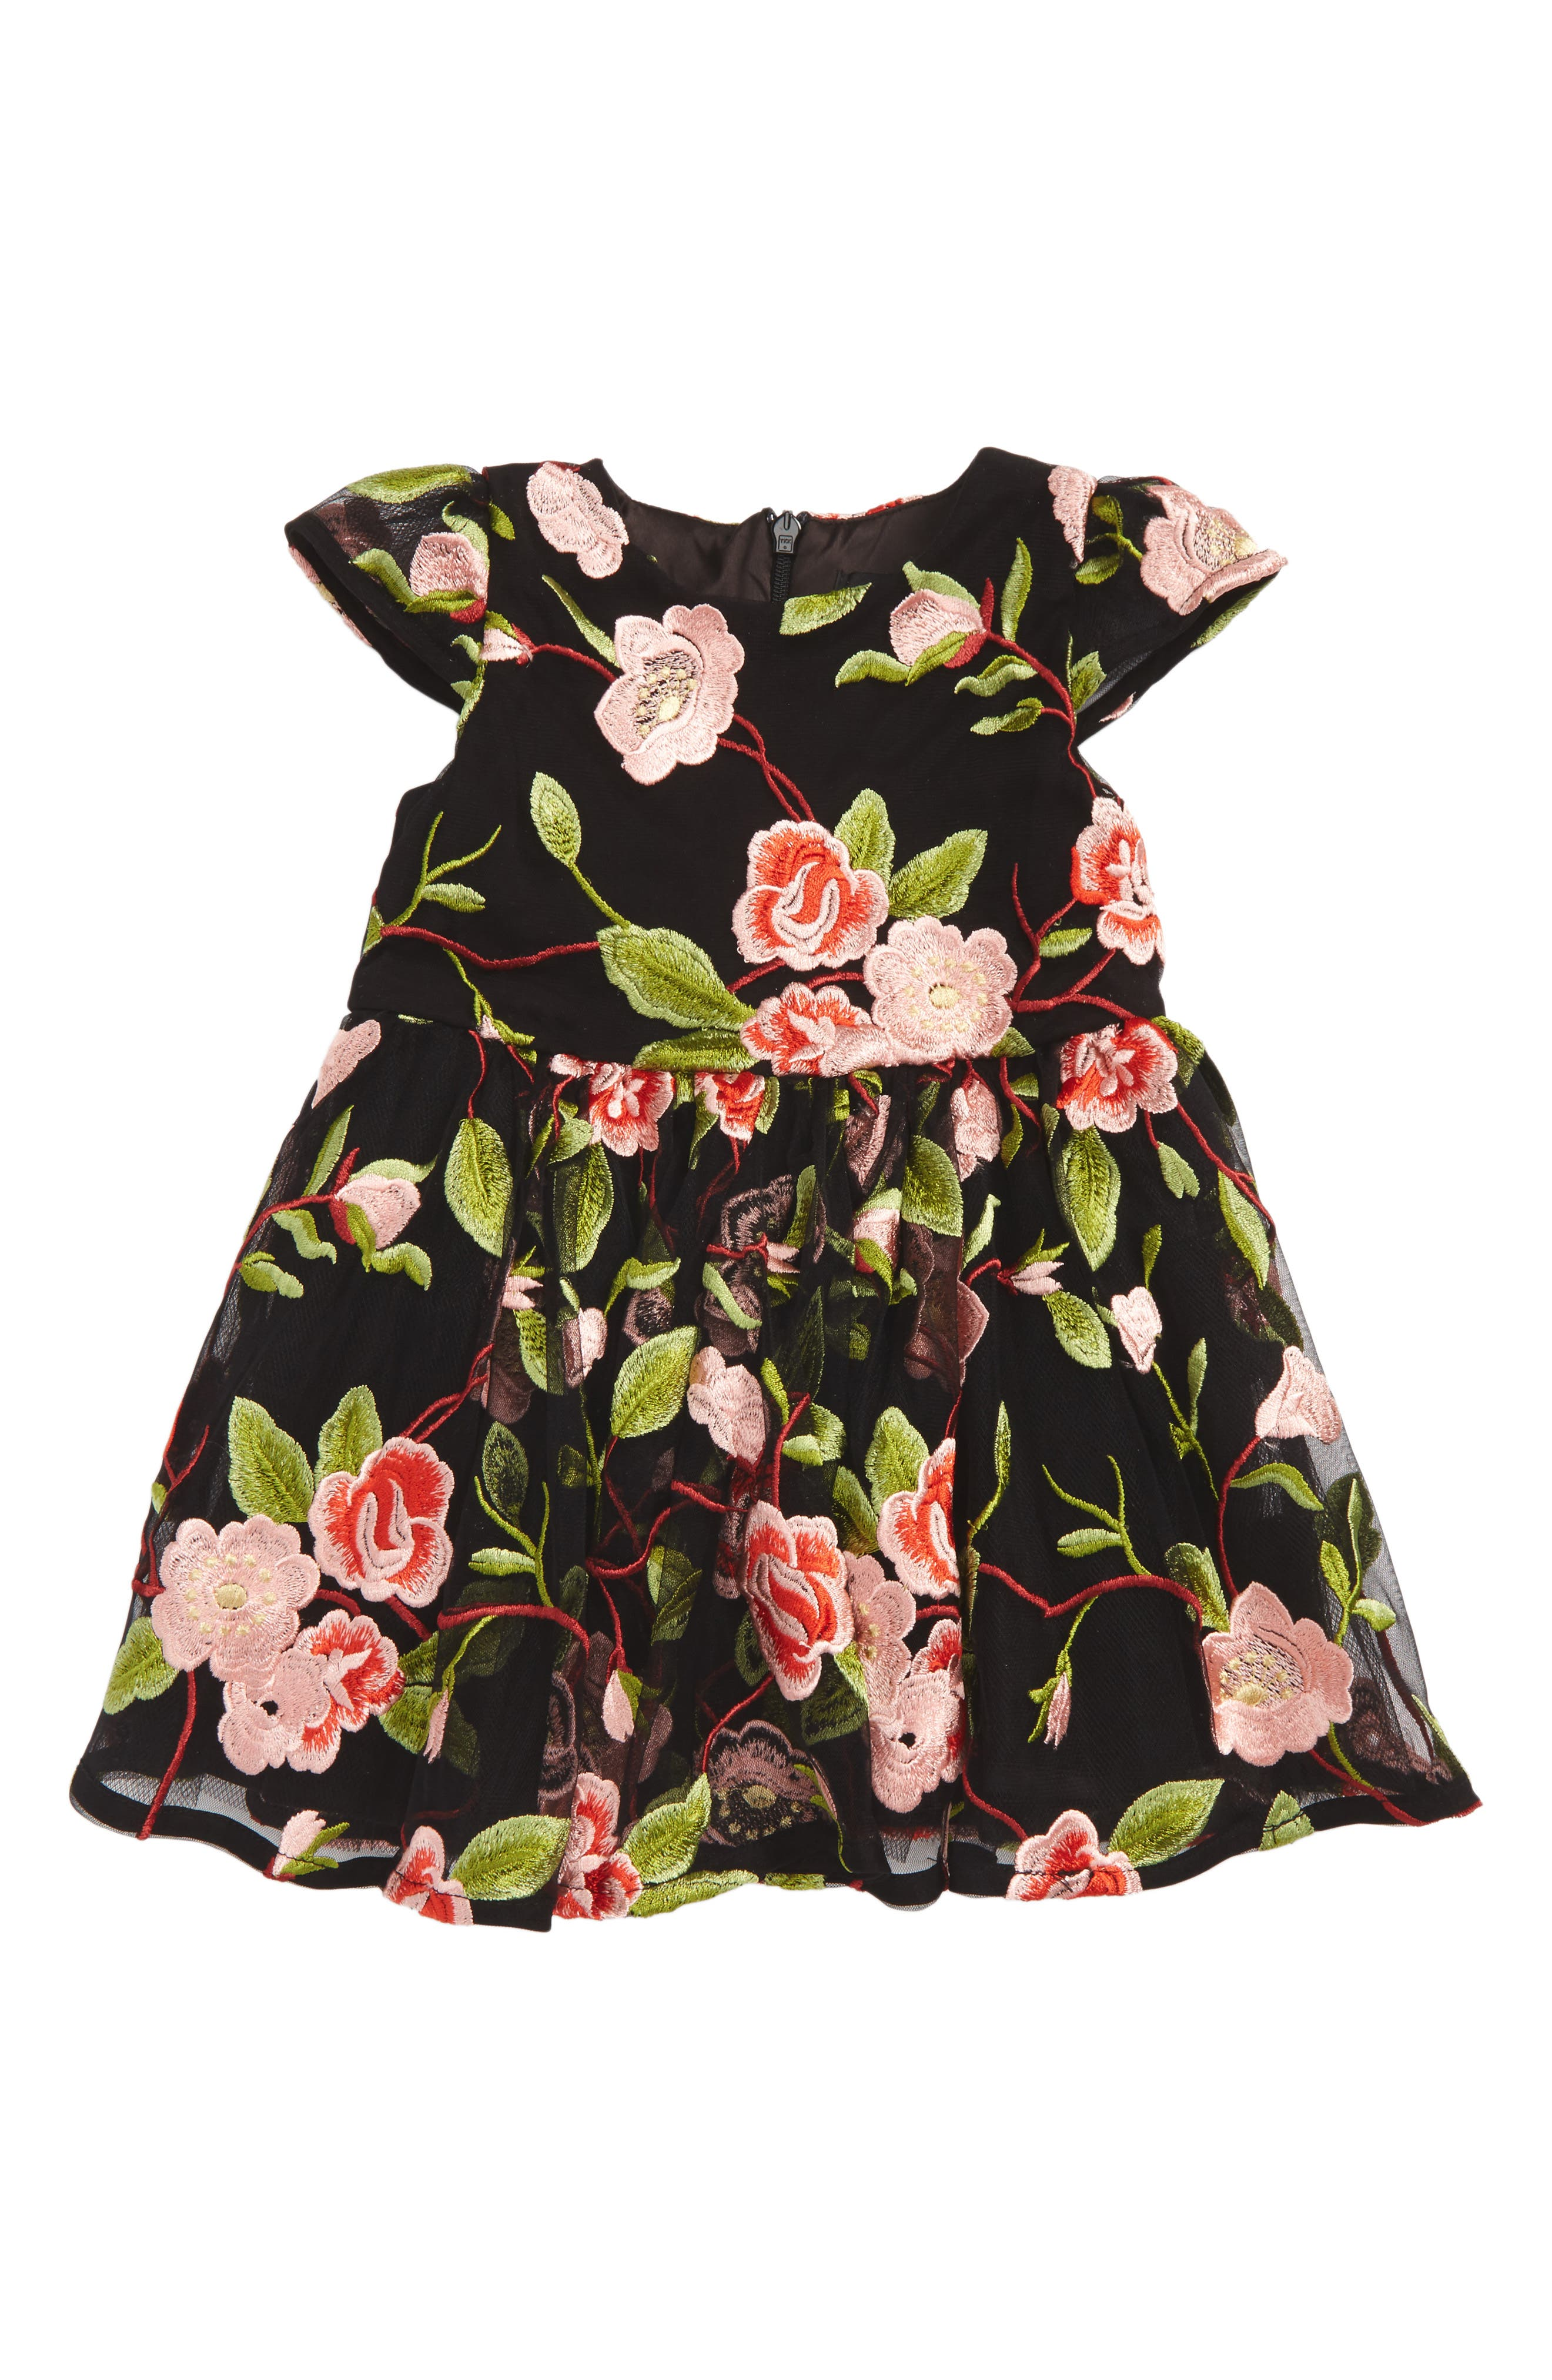 Alternate Image 1 Selected - Bardot Junior Holly Floral Dress (Baby Girls & Toddler Girls)